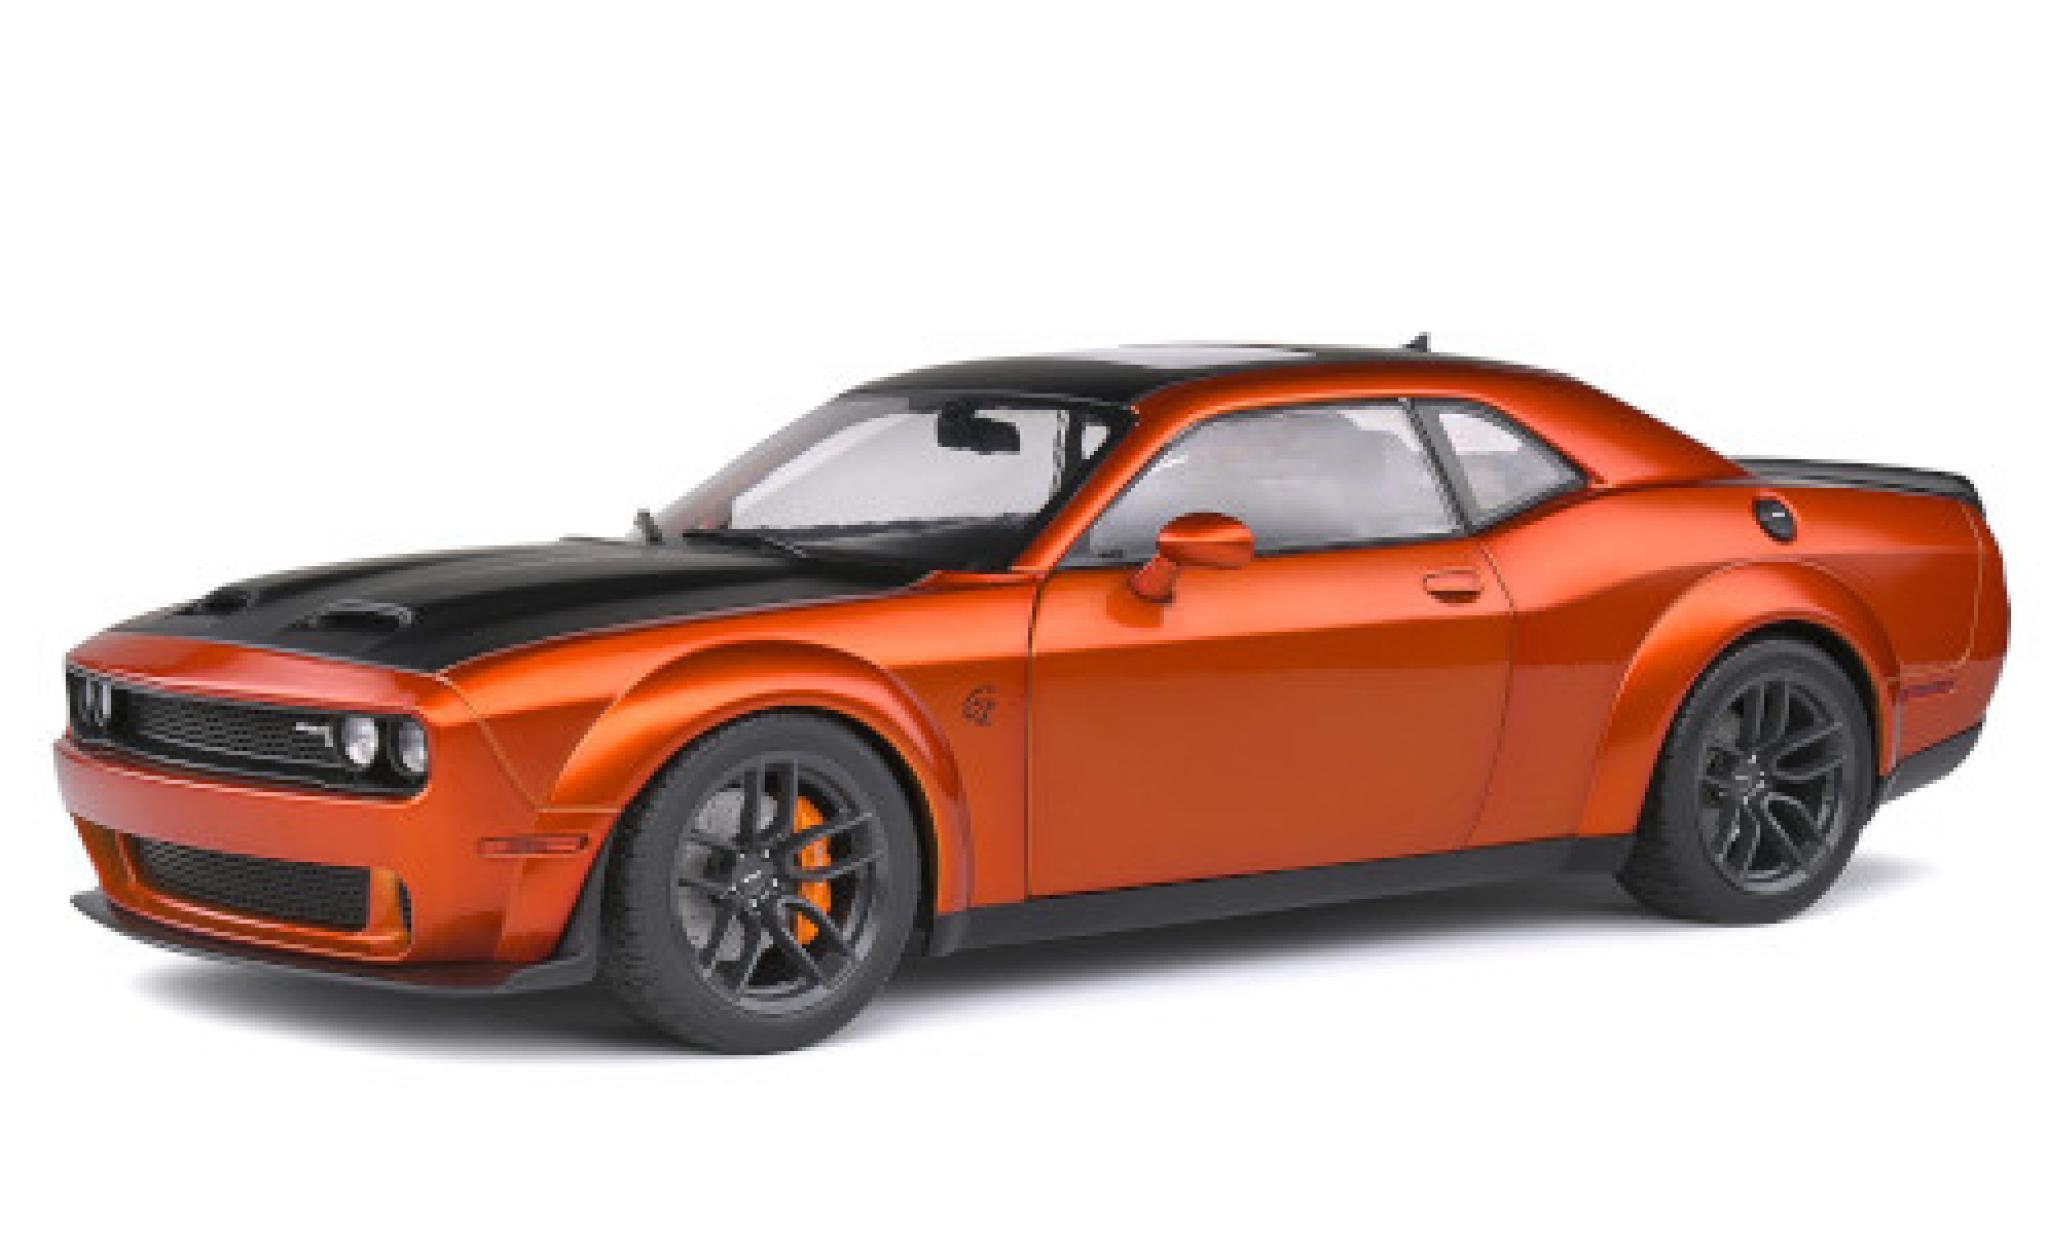 Dodge Challenger 1/18 Solido SRT Hellcat Redeye kupfer/matt-noire 2020